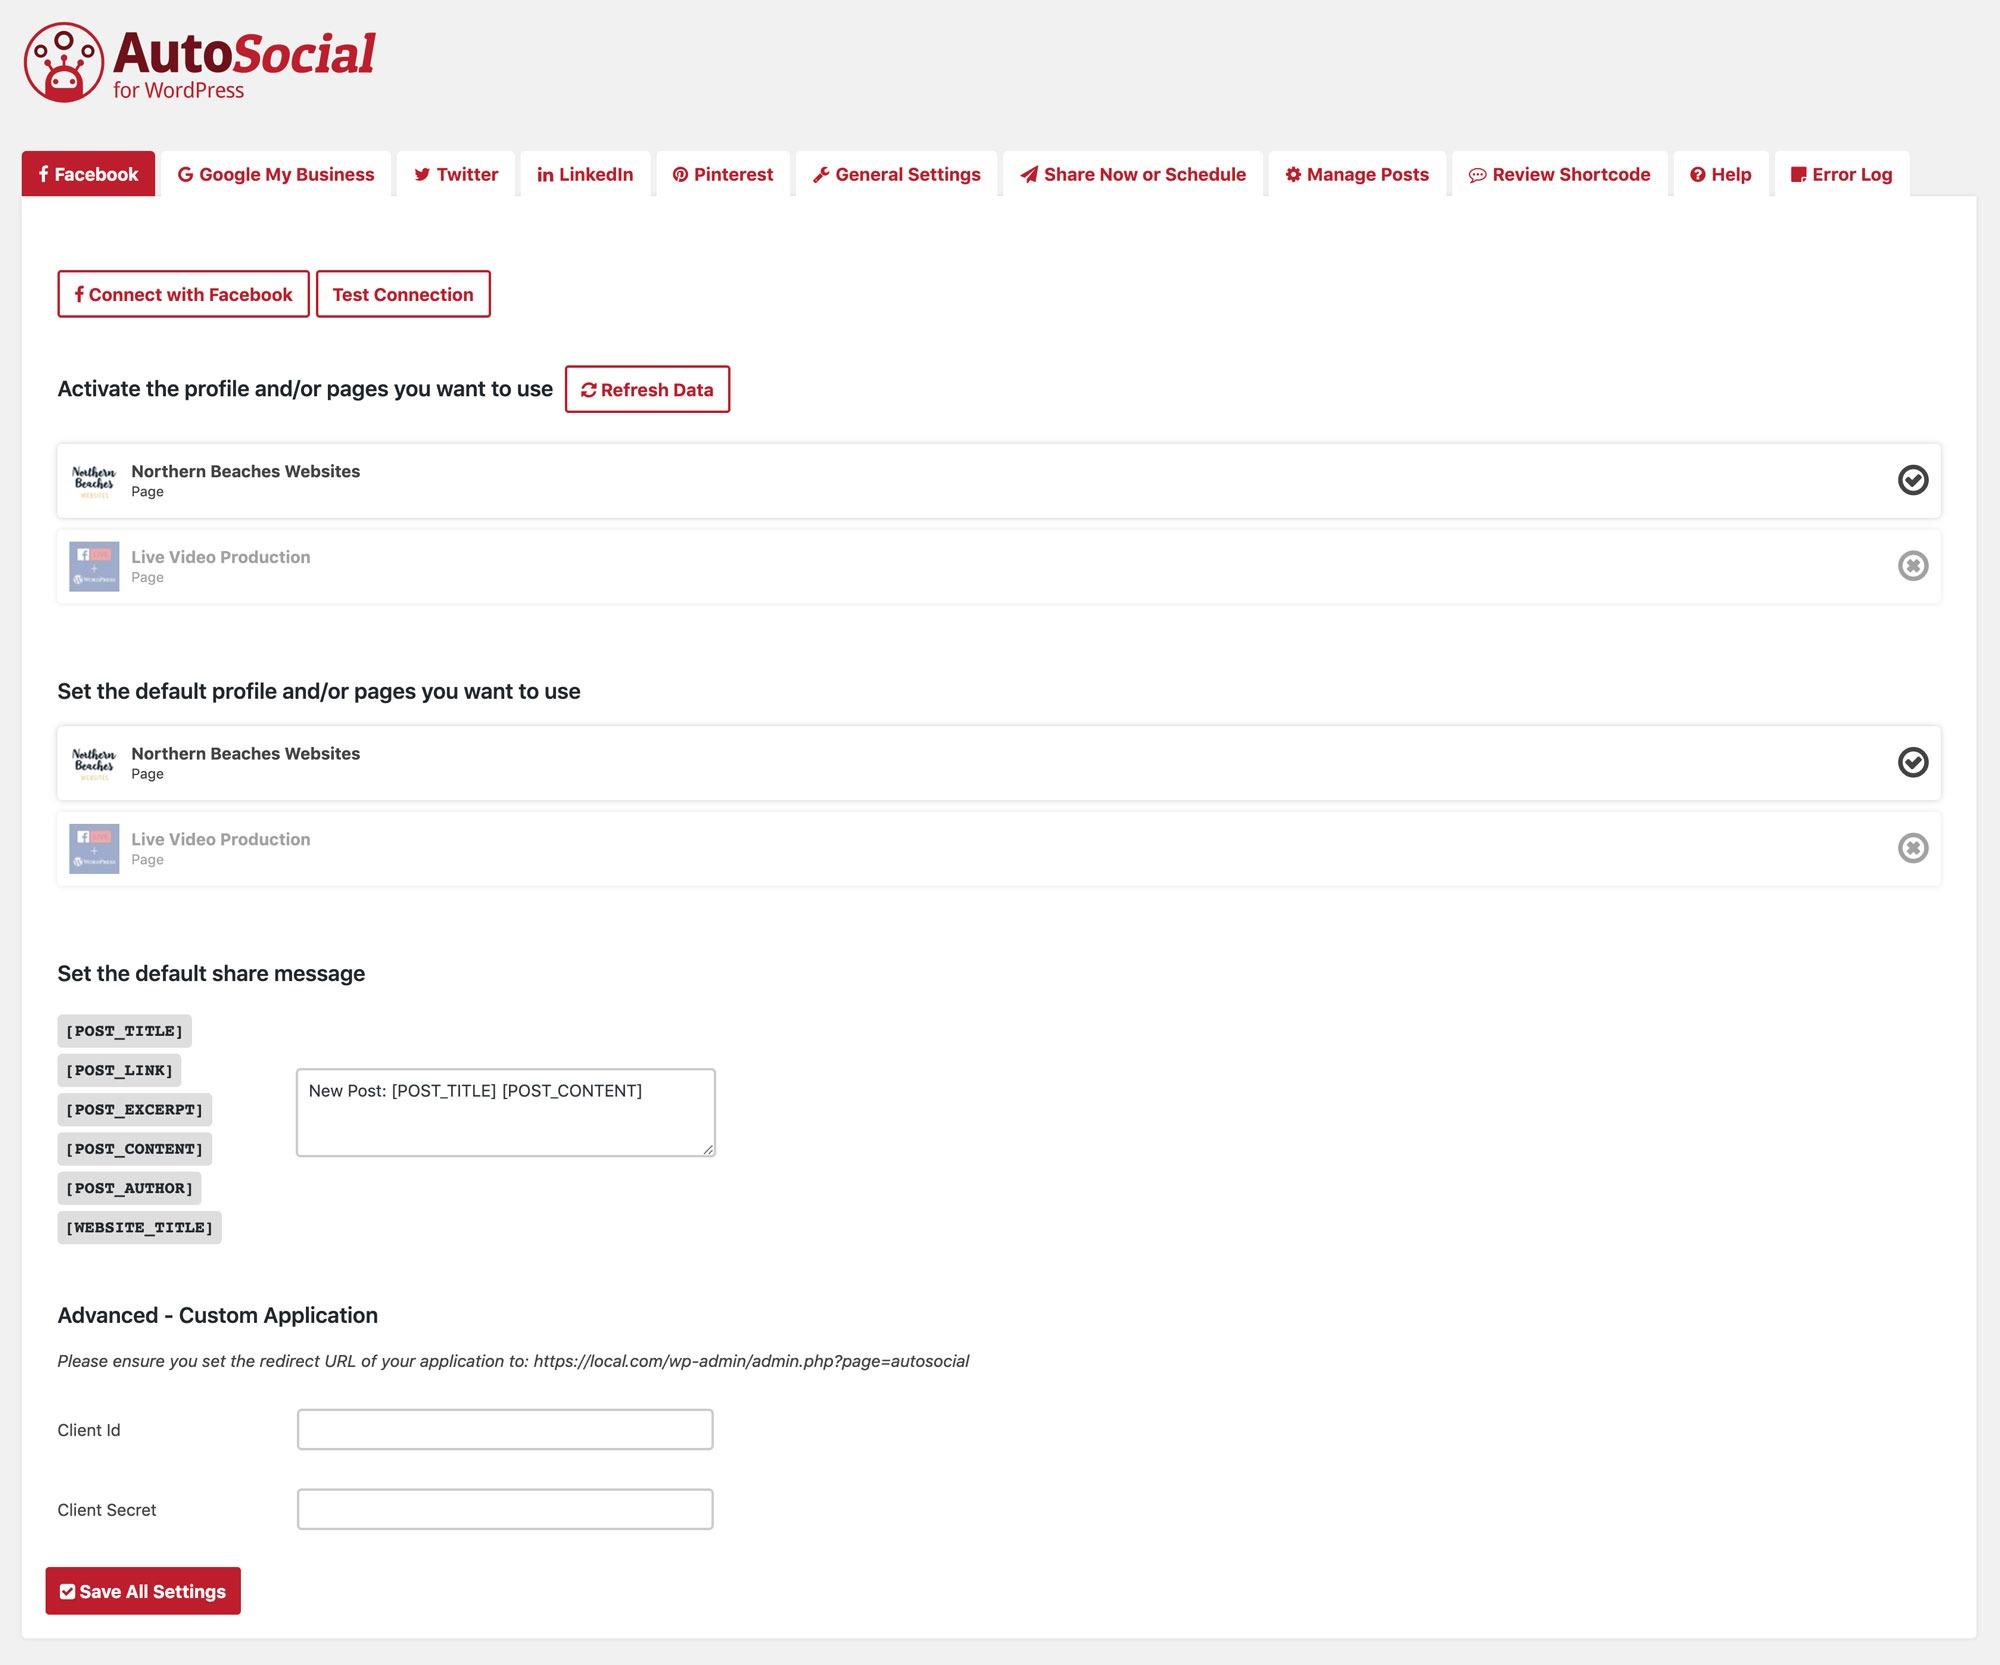 AutoSocial main interface